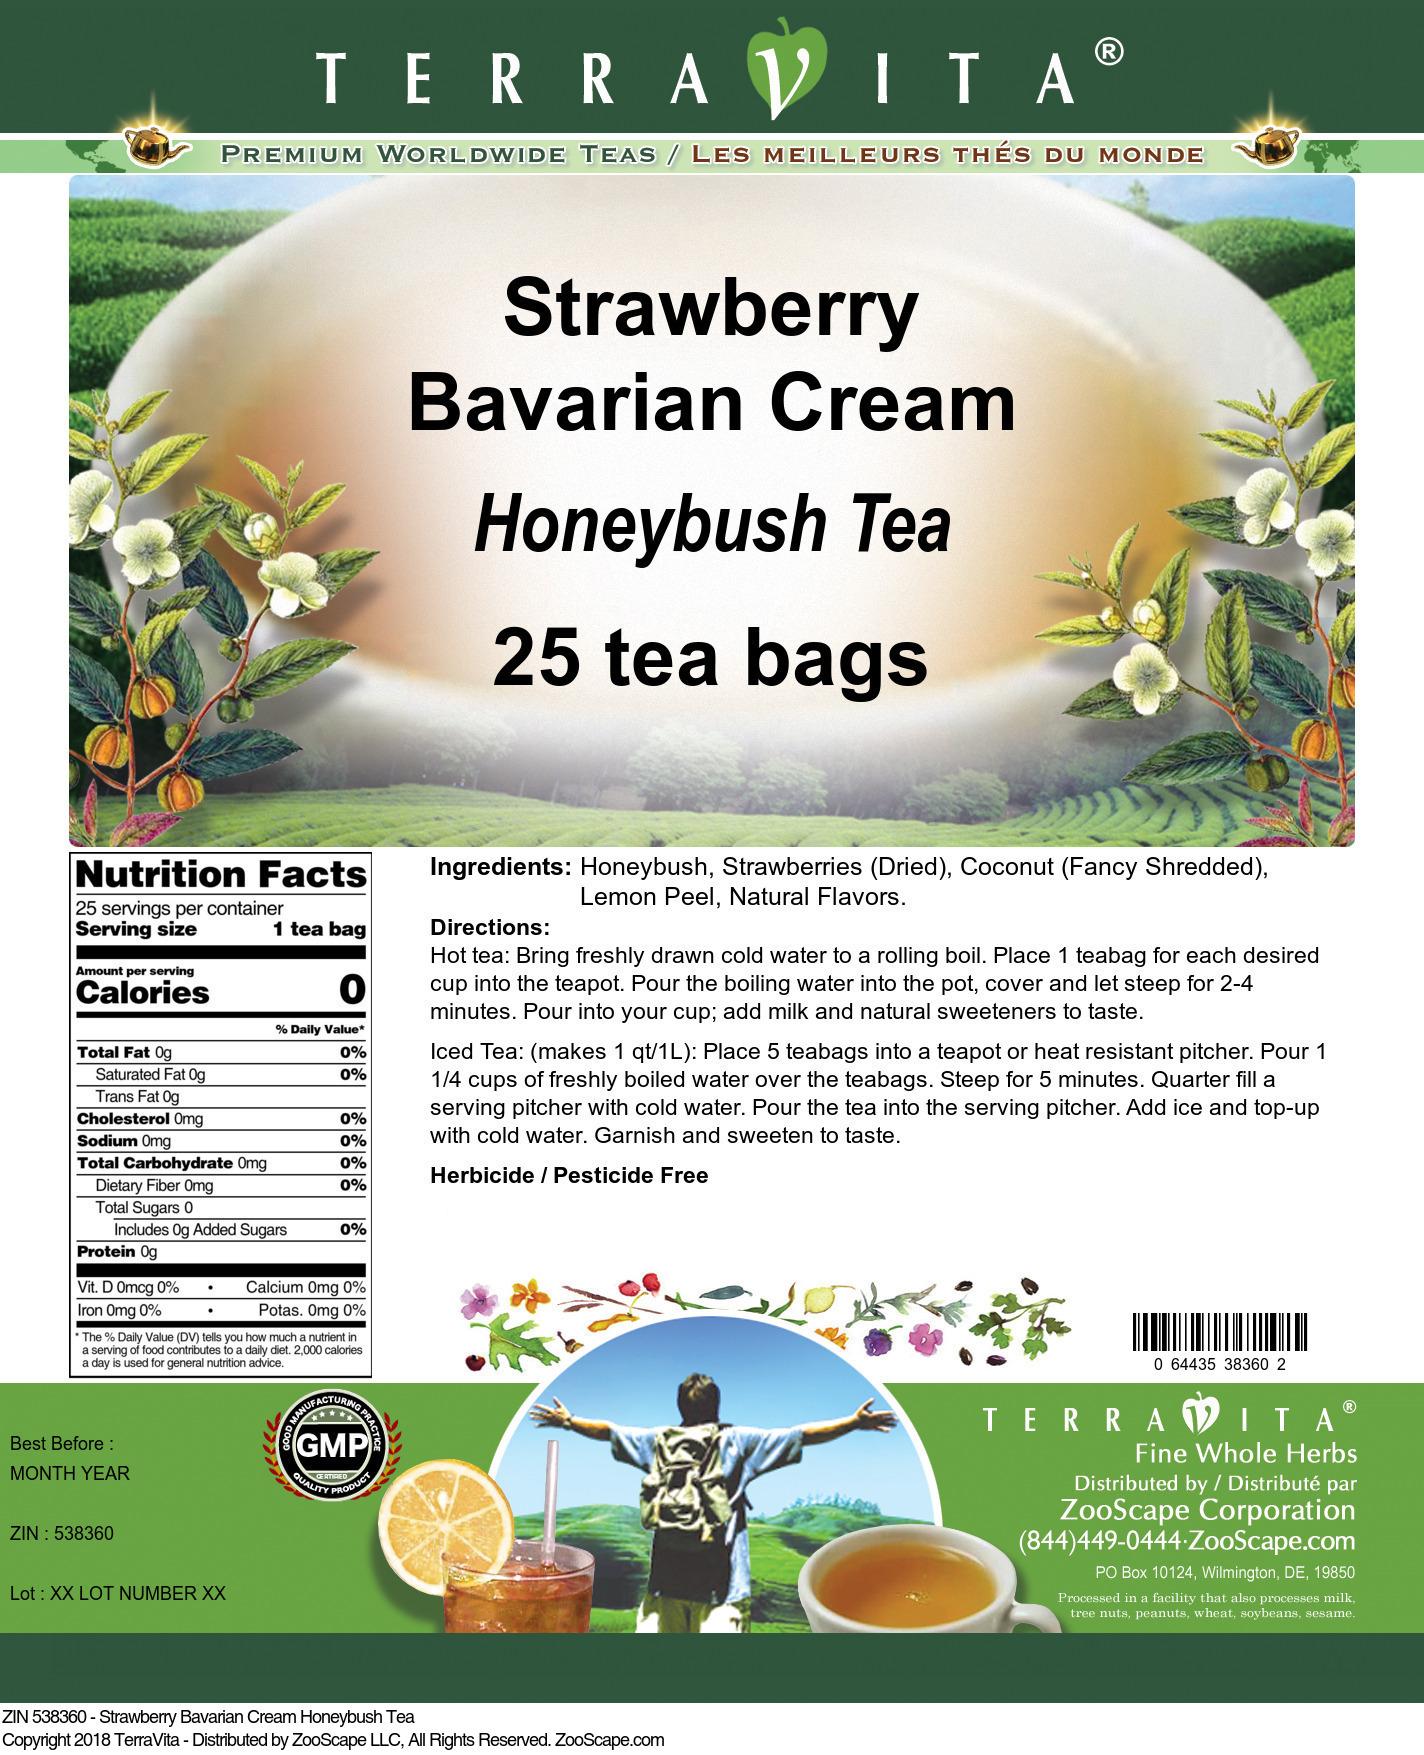 Strawberry Bavarian Cream Honeybush Tea